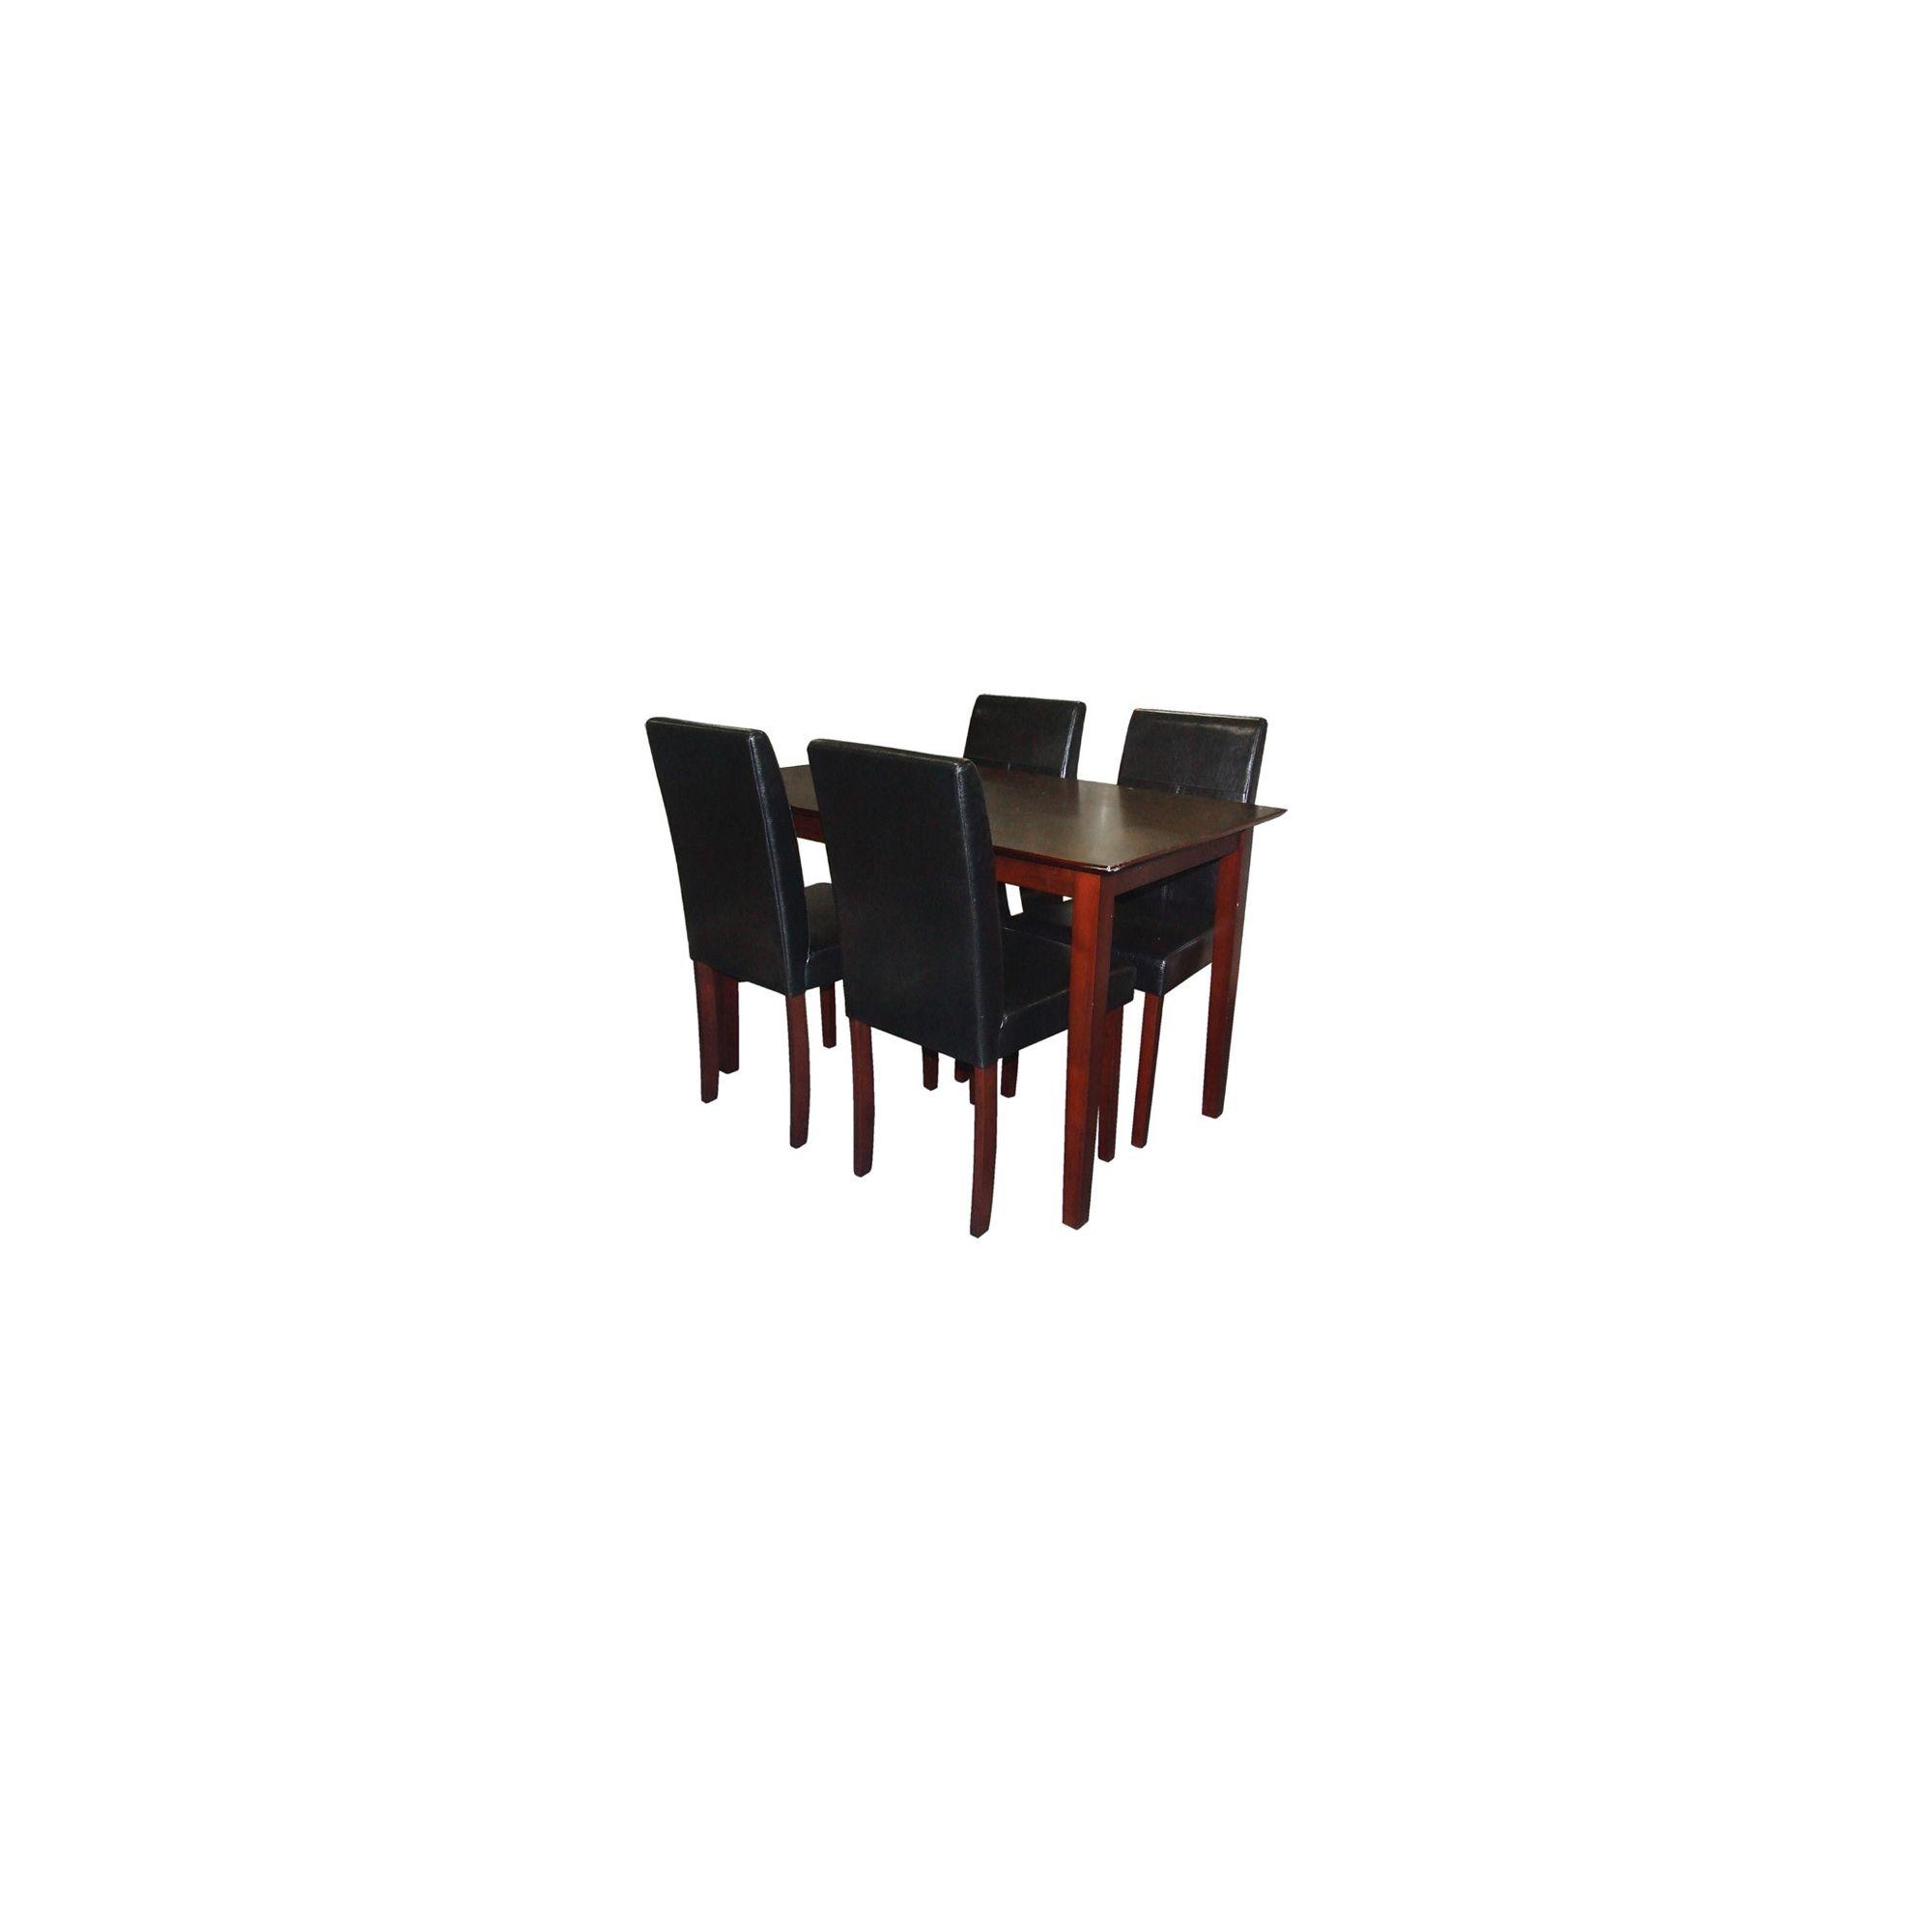 Premier Housewares 5 Piece Dining Set - Black at Tescos Direct